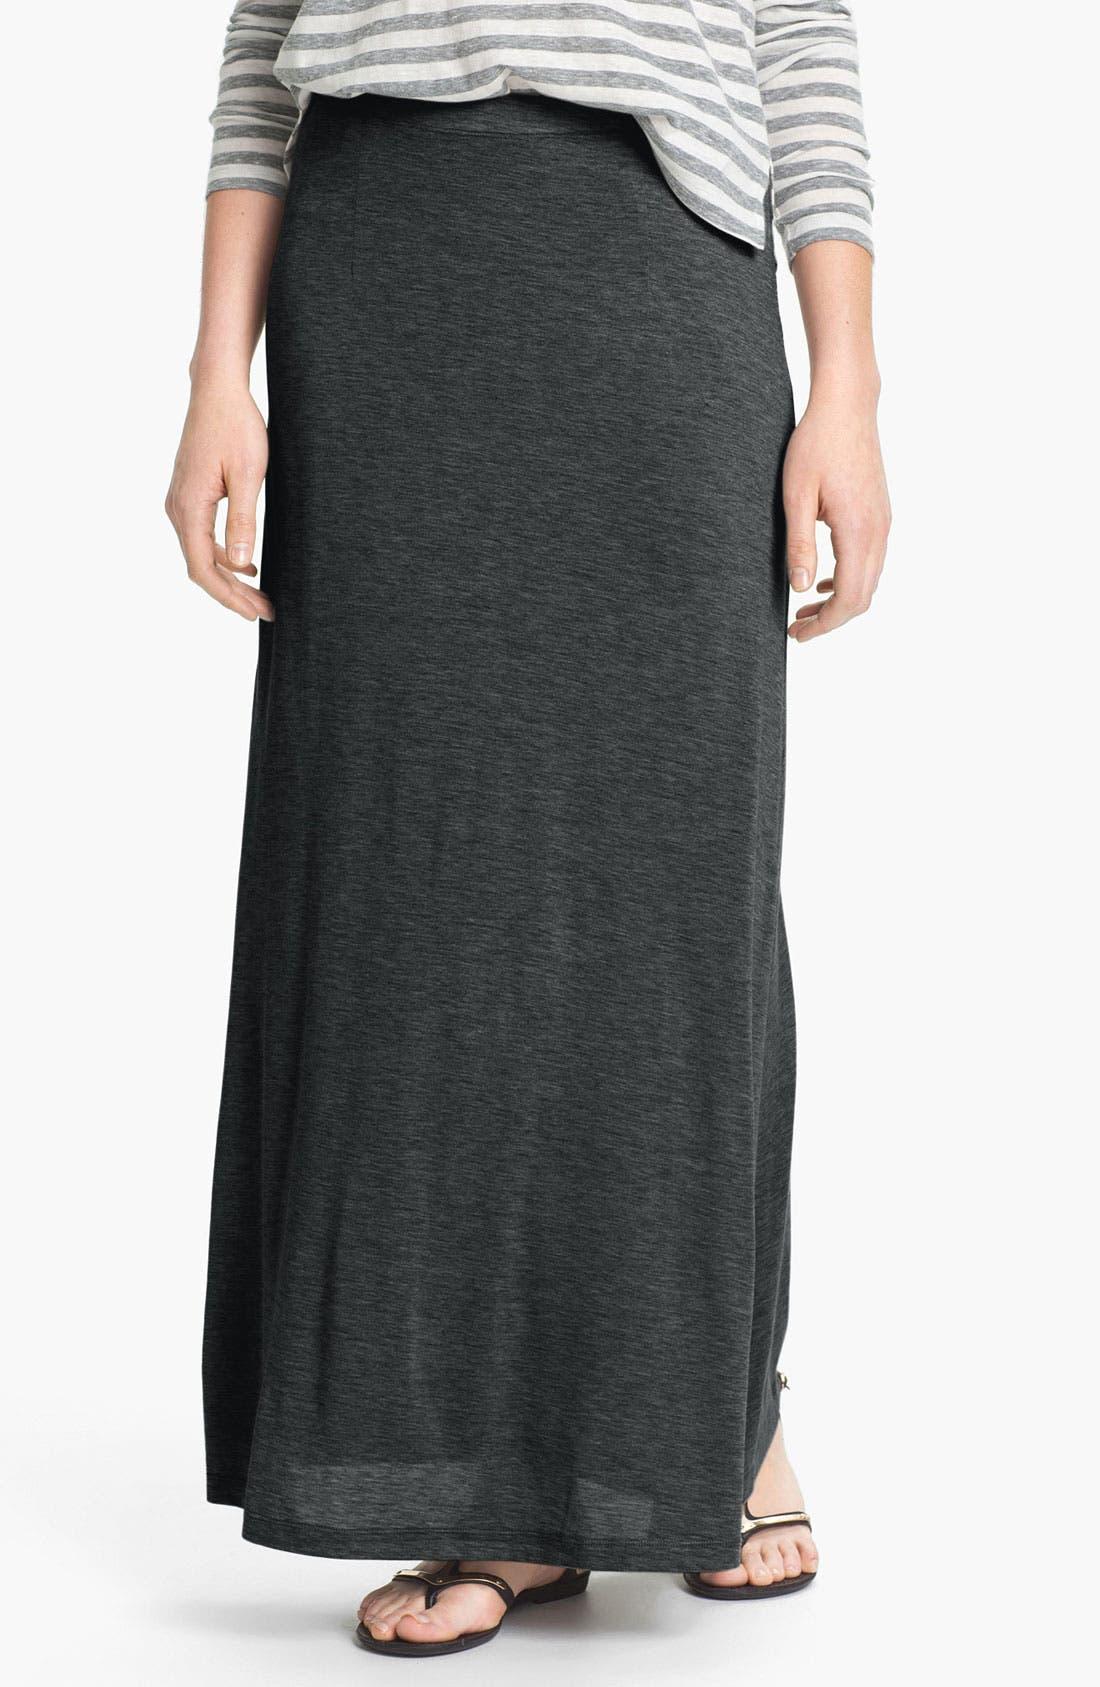 EILEEN FISHER Silk & Cotton Jersey Maxi Skirt, Main, color, 025